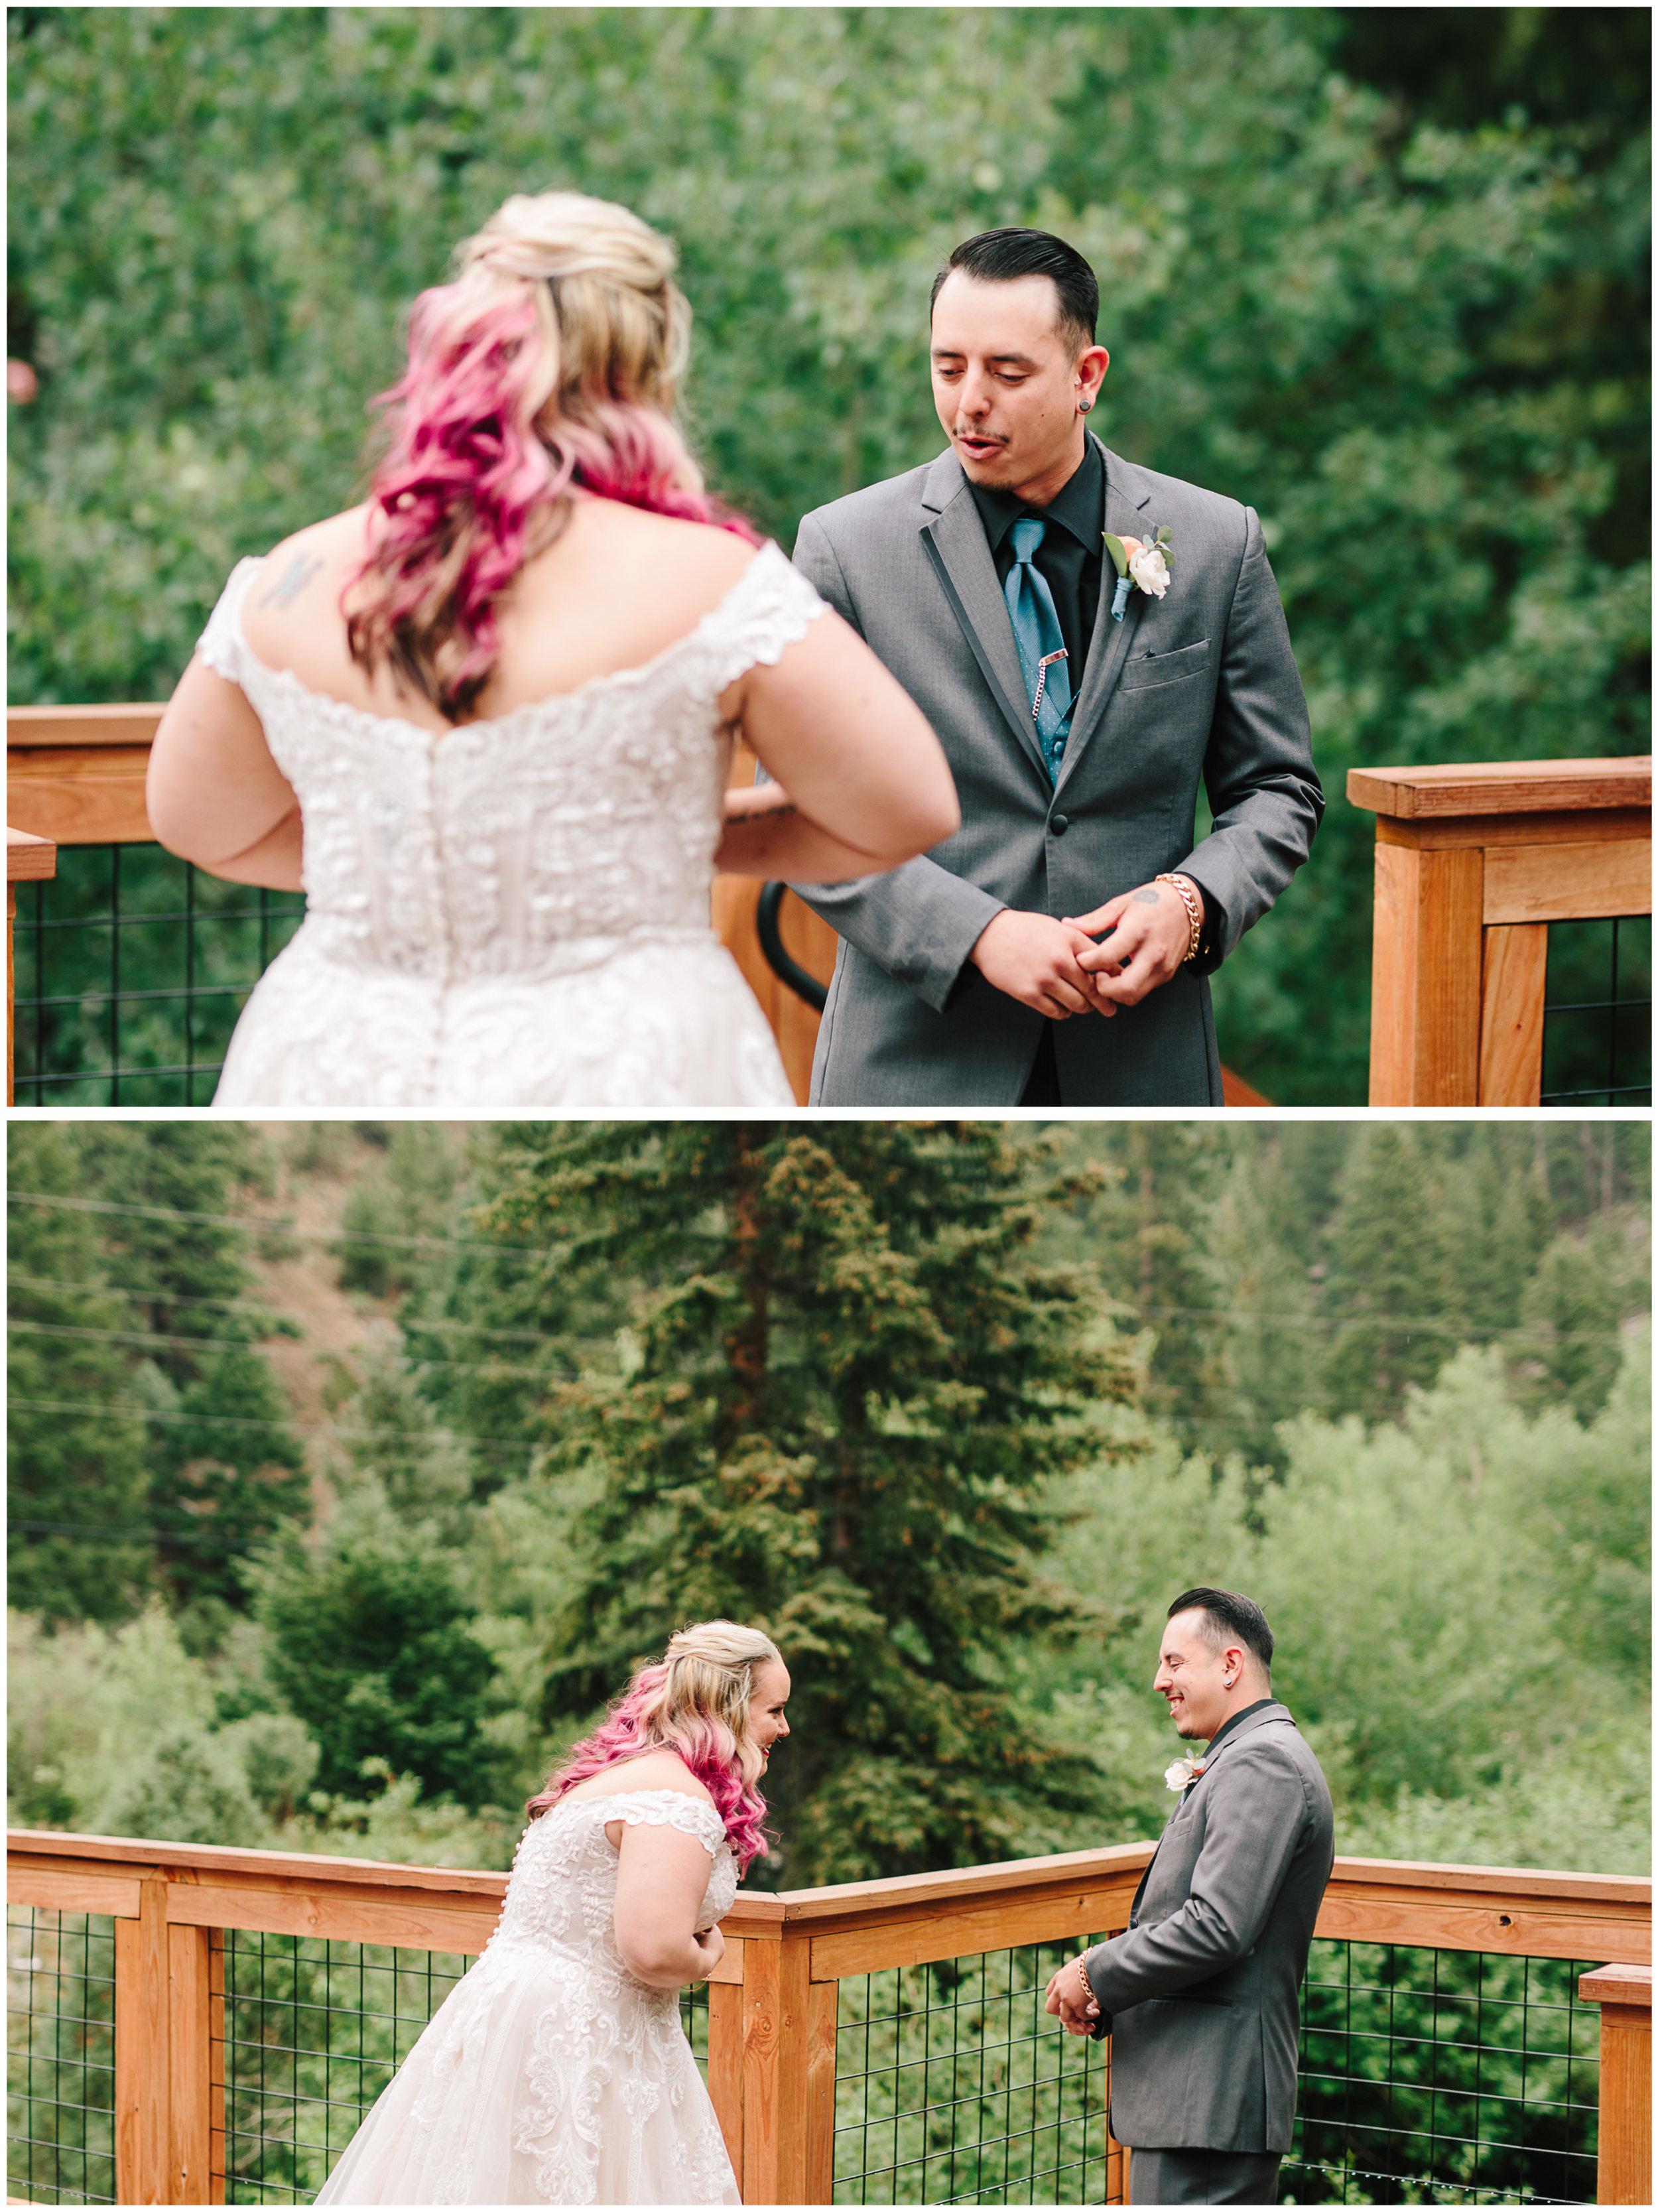 blackstone_rivers_ranch_wedding_24.jpg